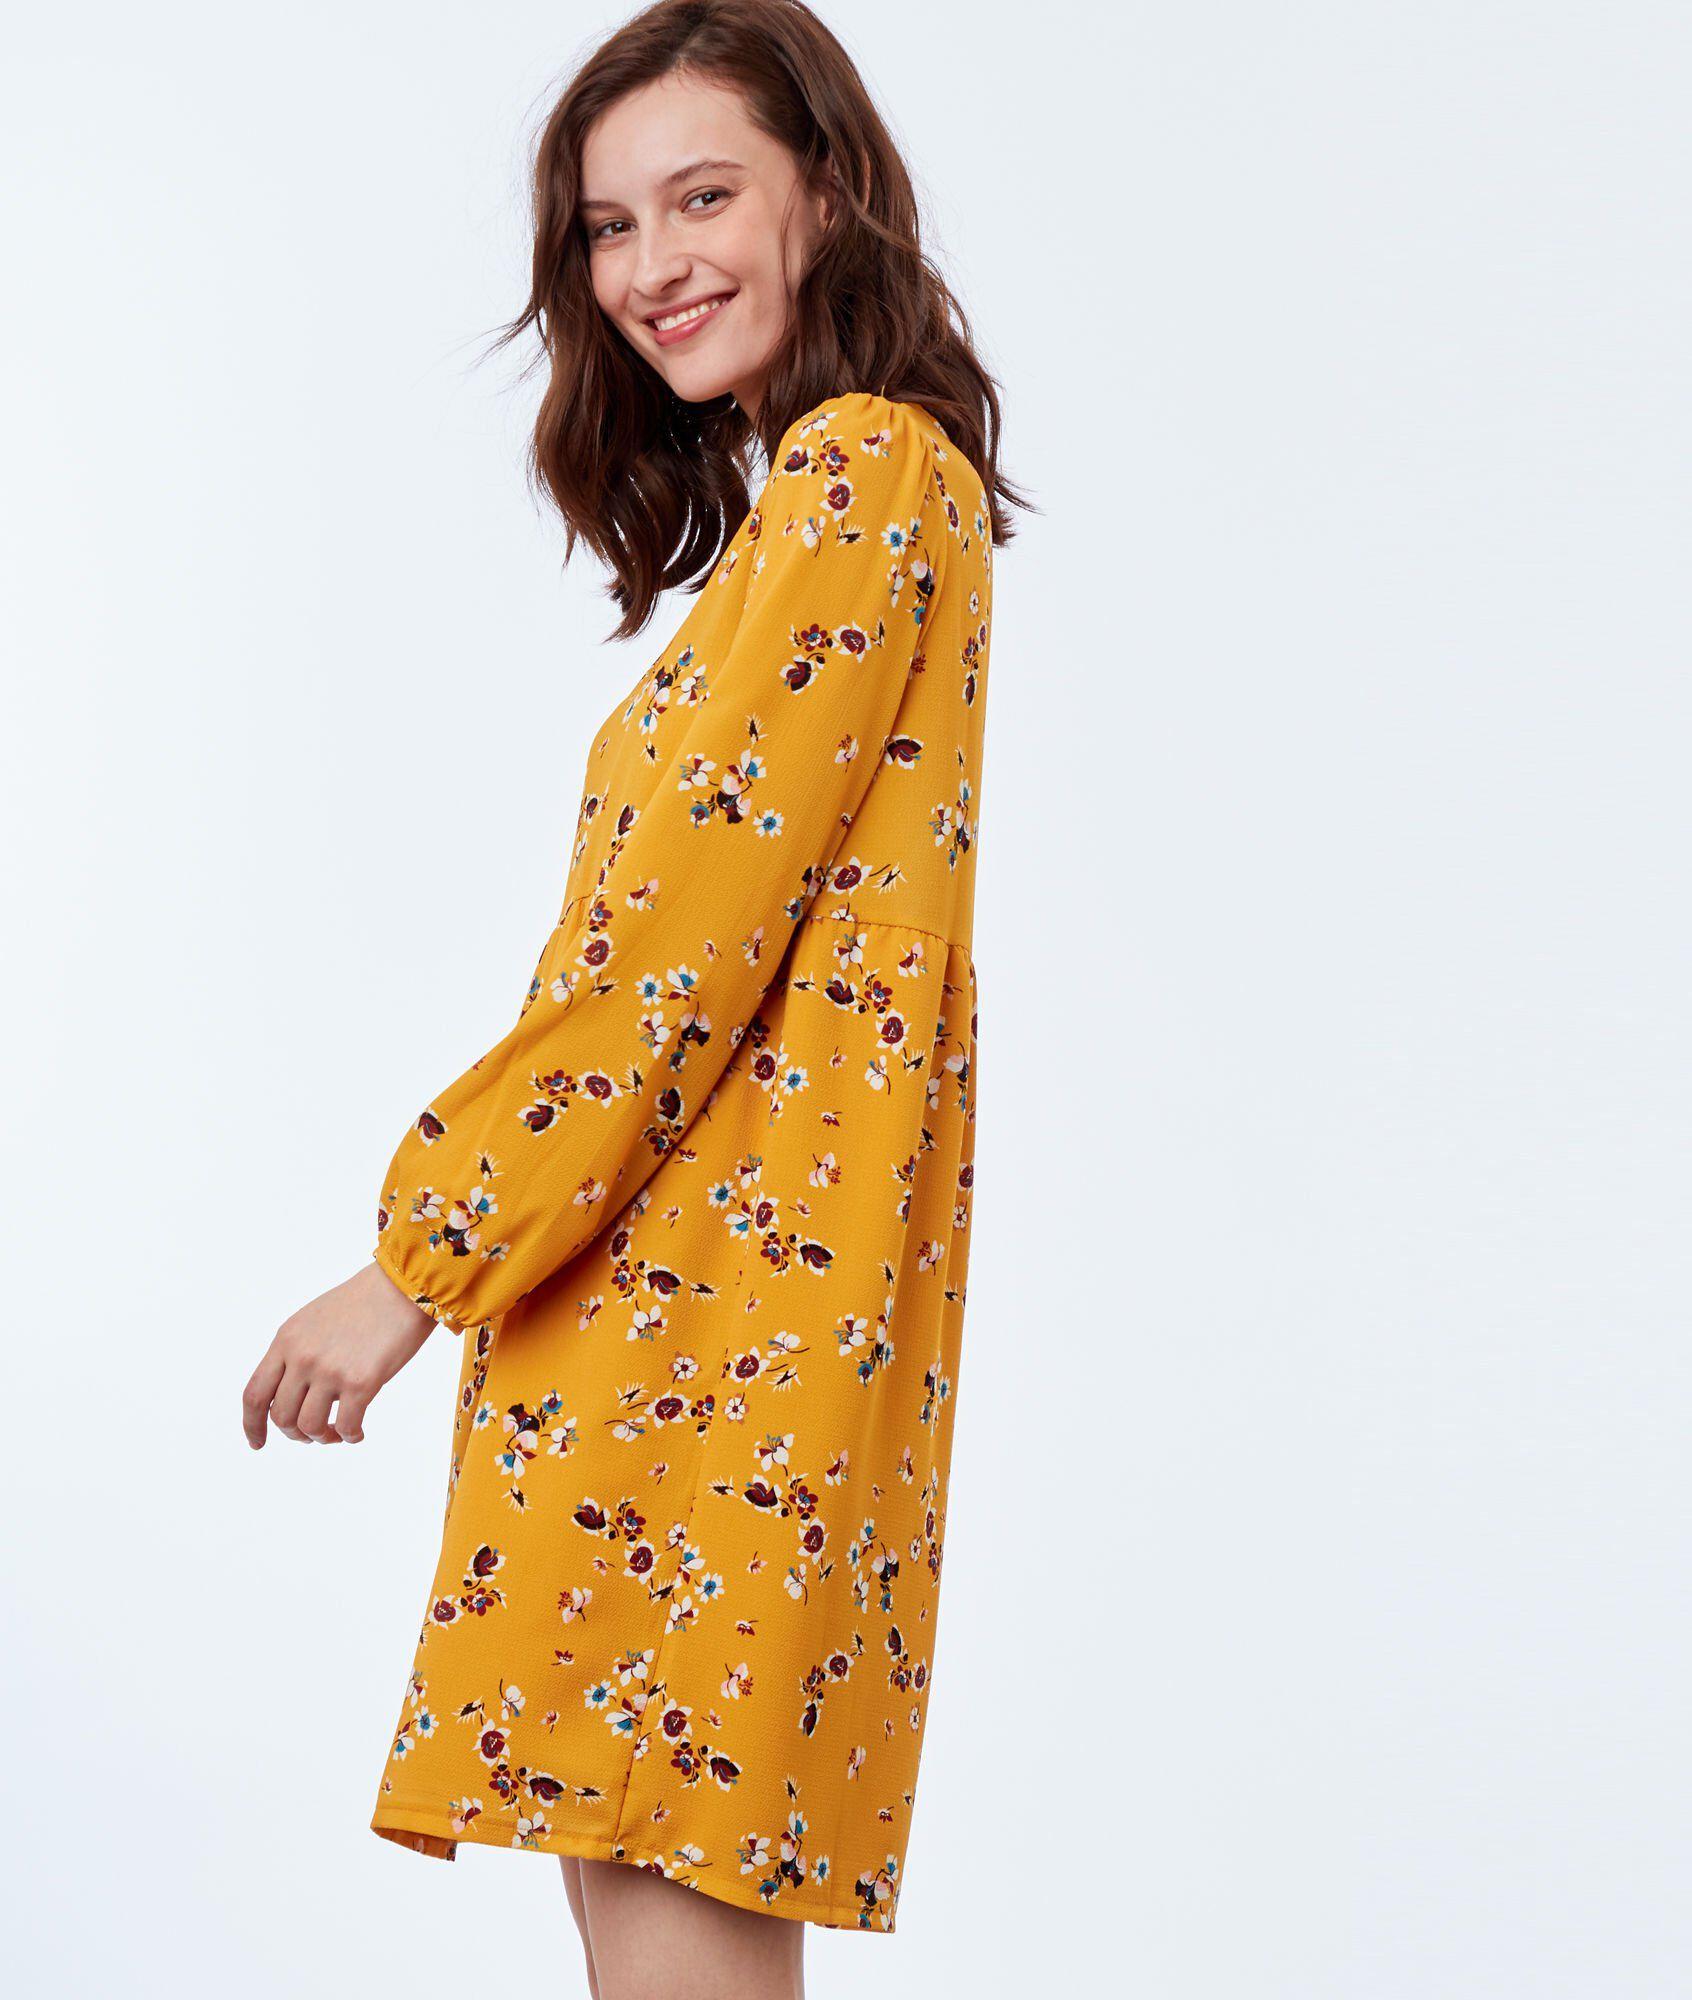 21f313e084c9c Robe imprimée fleurs - JANYS - OCRE - Etam